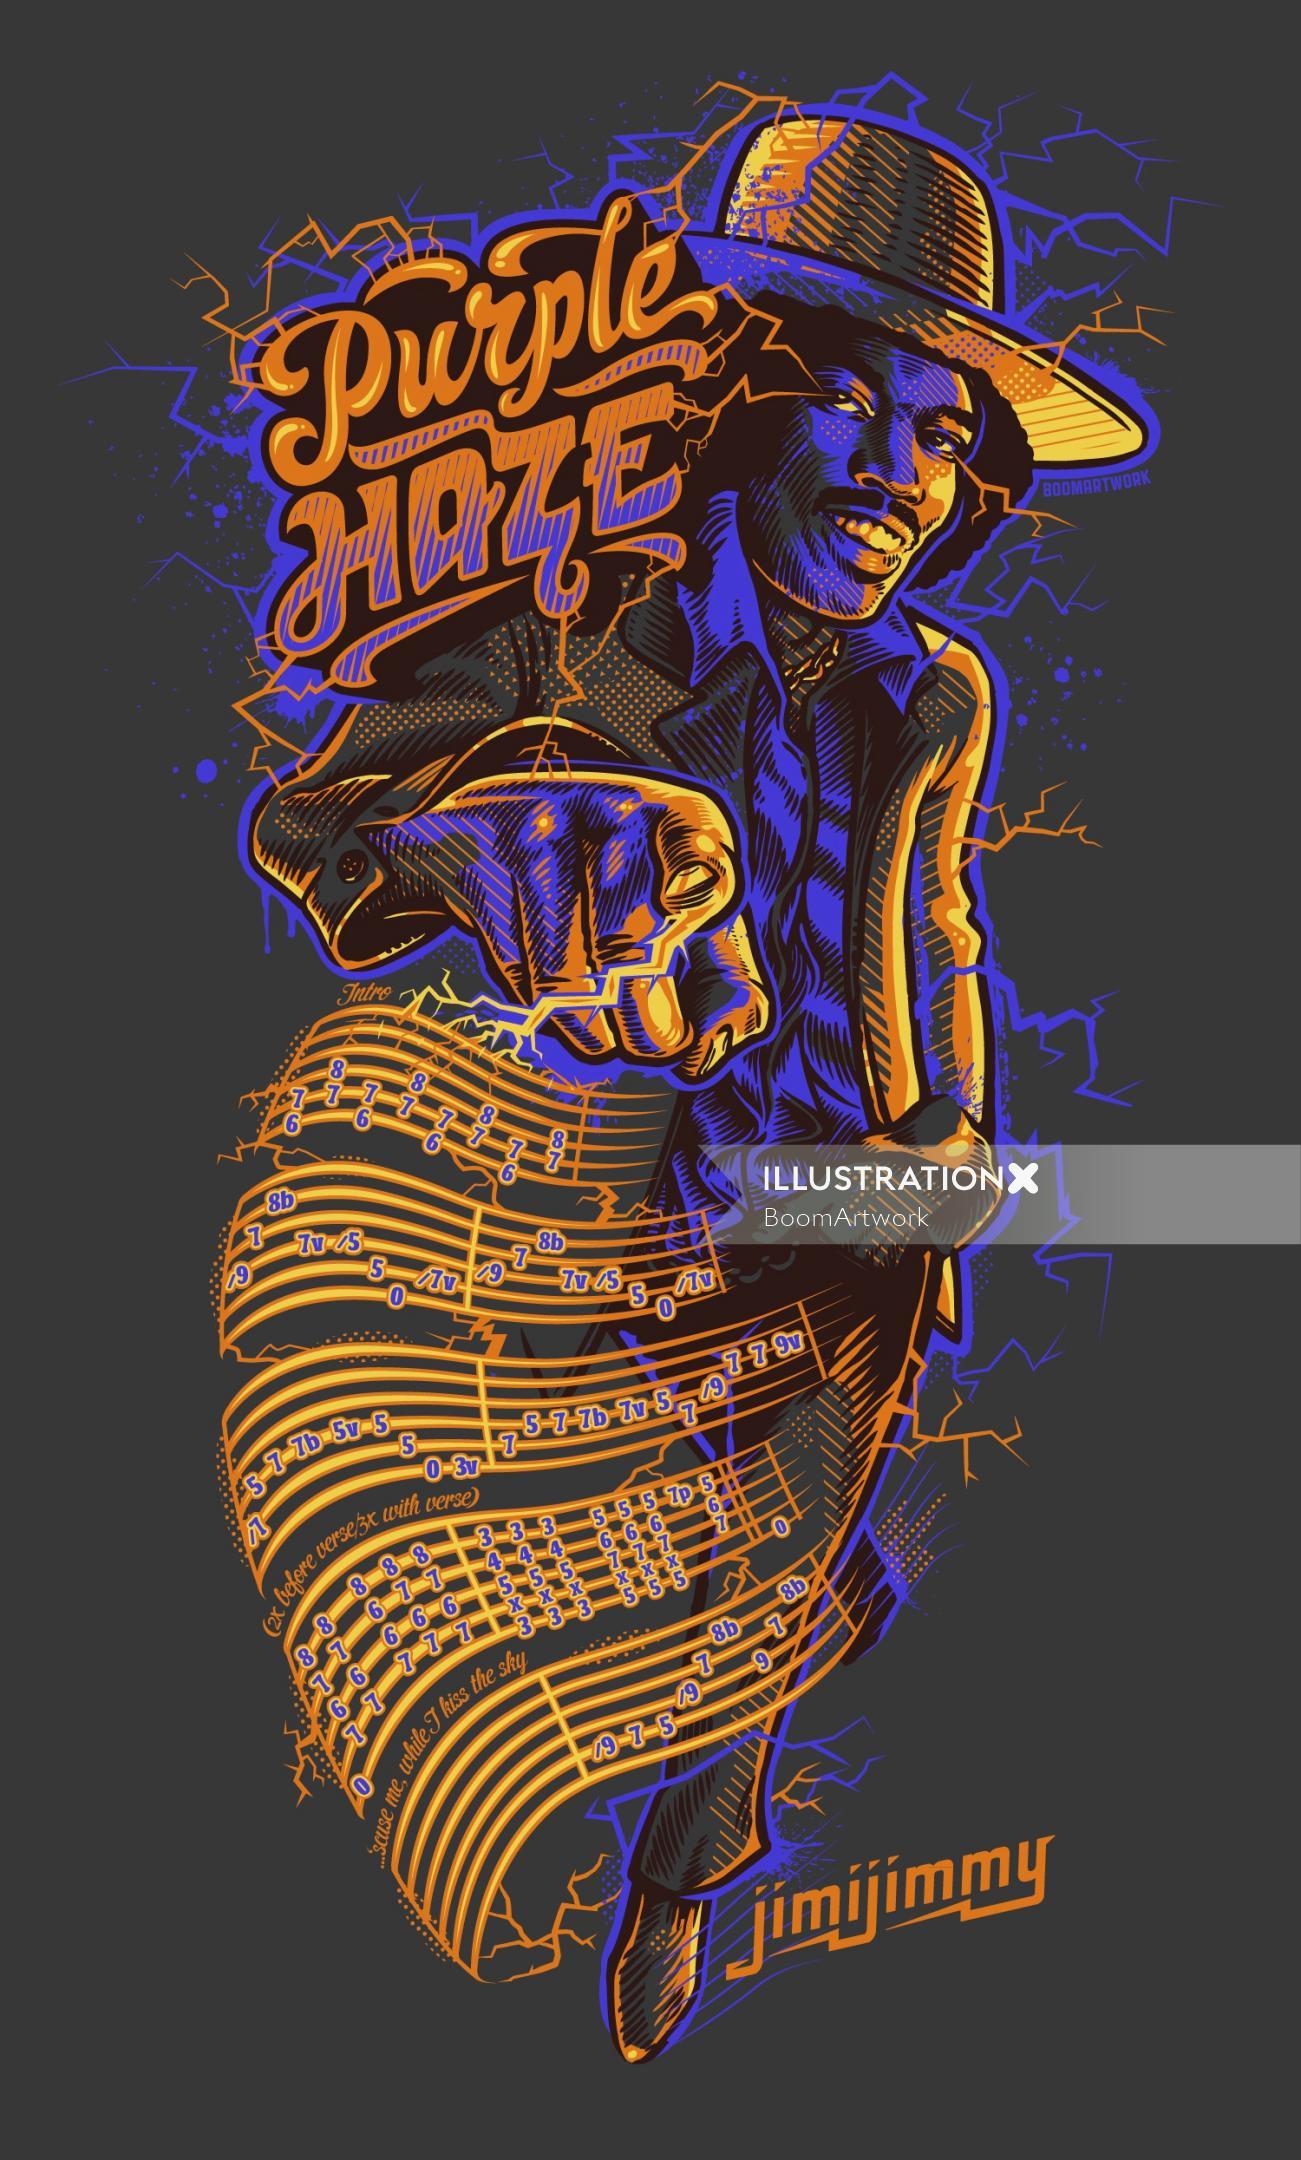 Purple haze jimmy t-shirt illustration